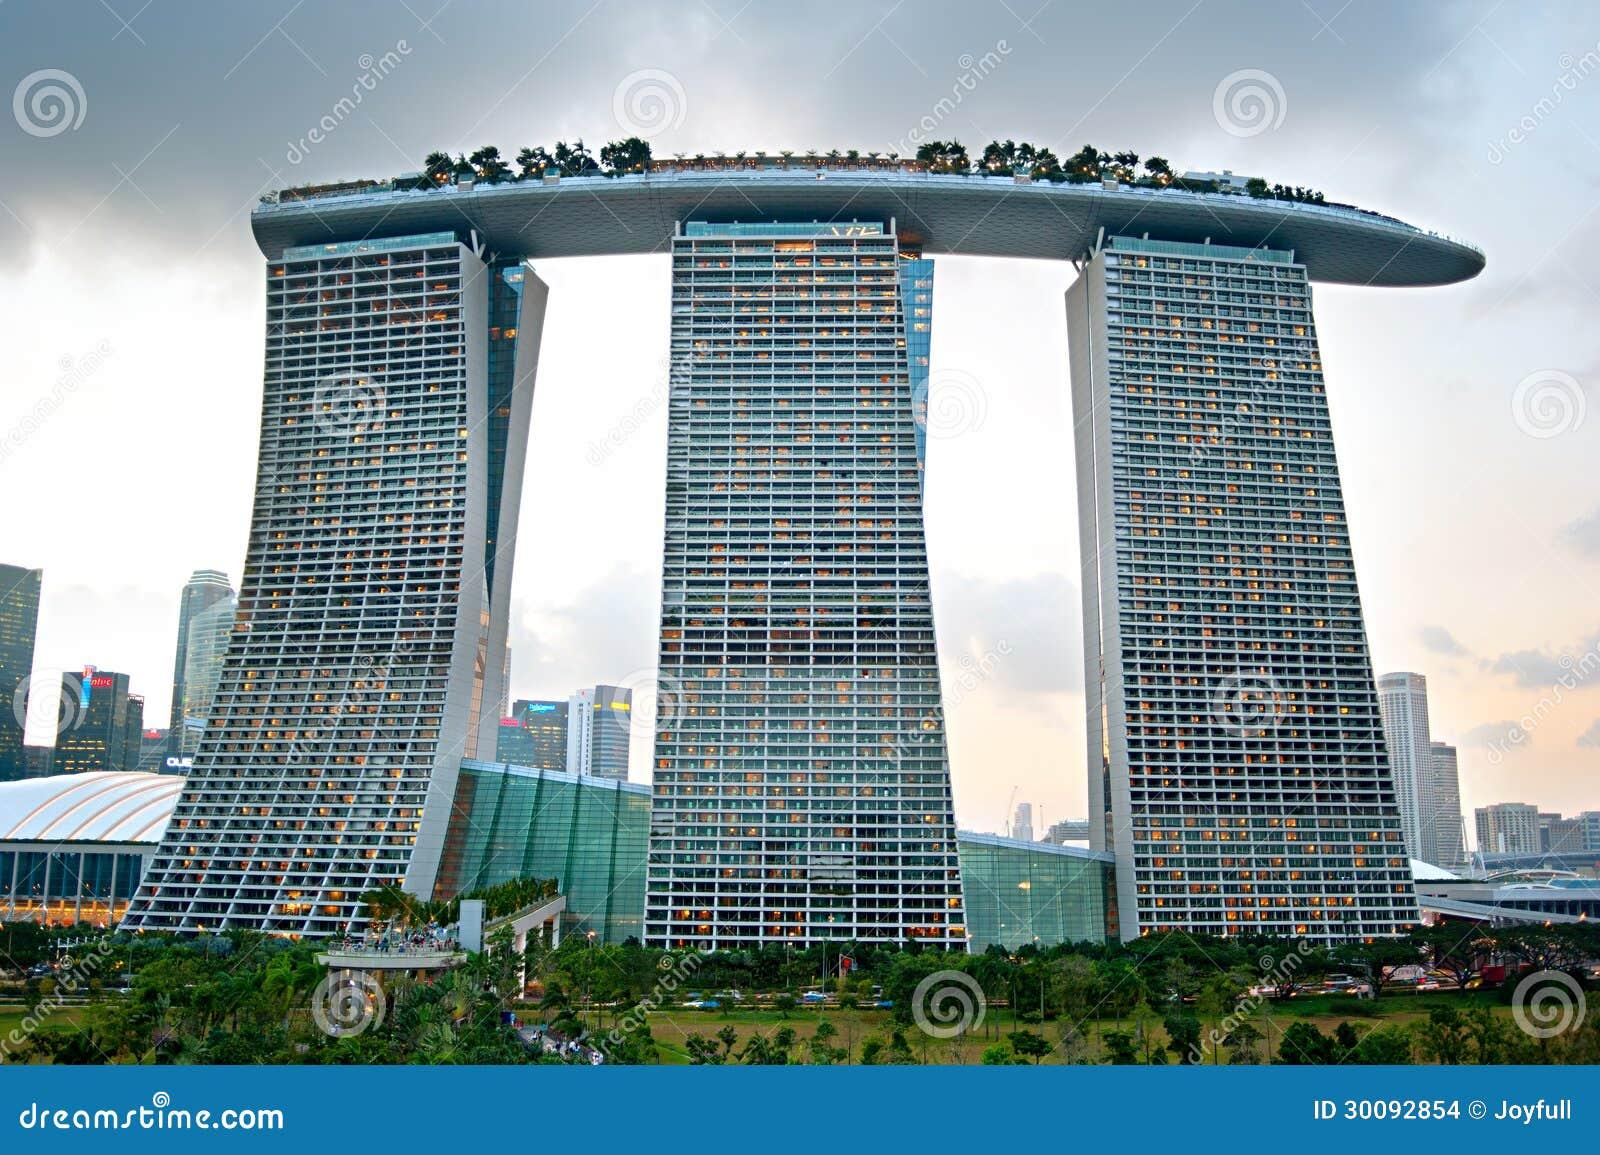 Casino dealer salary singapore